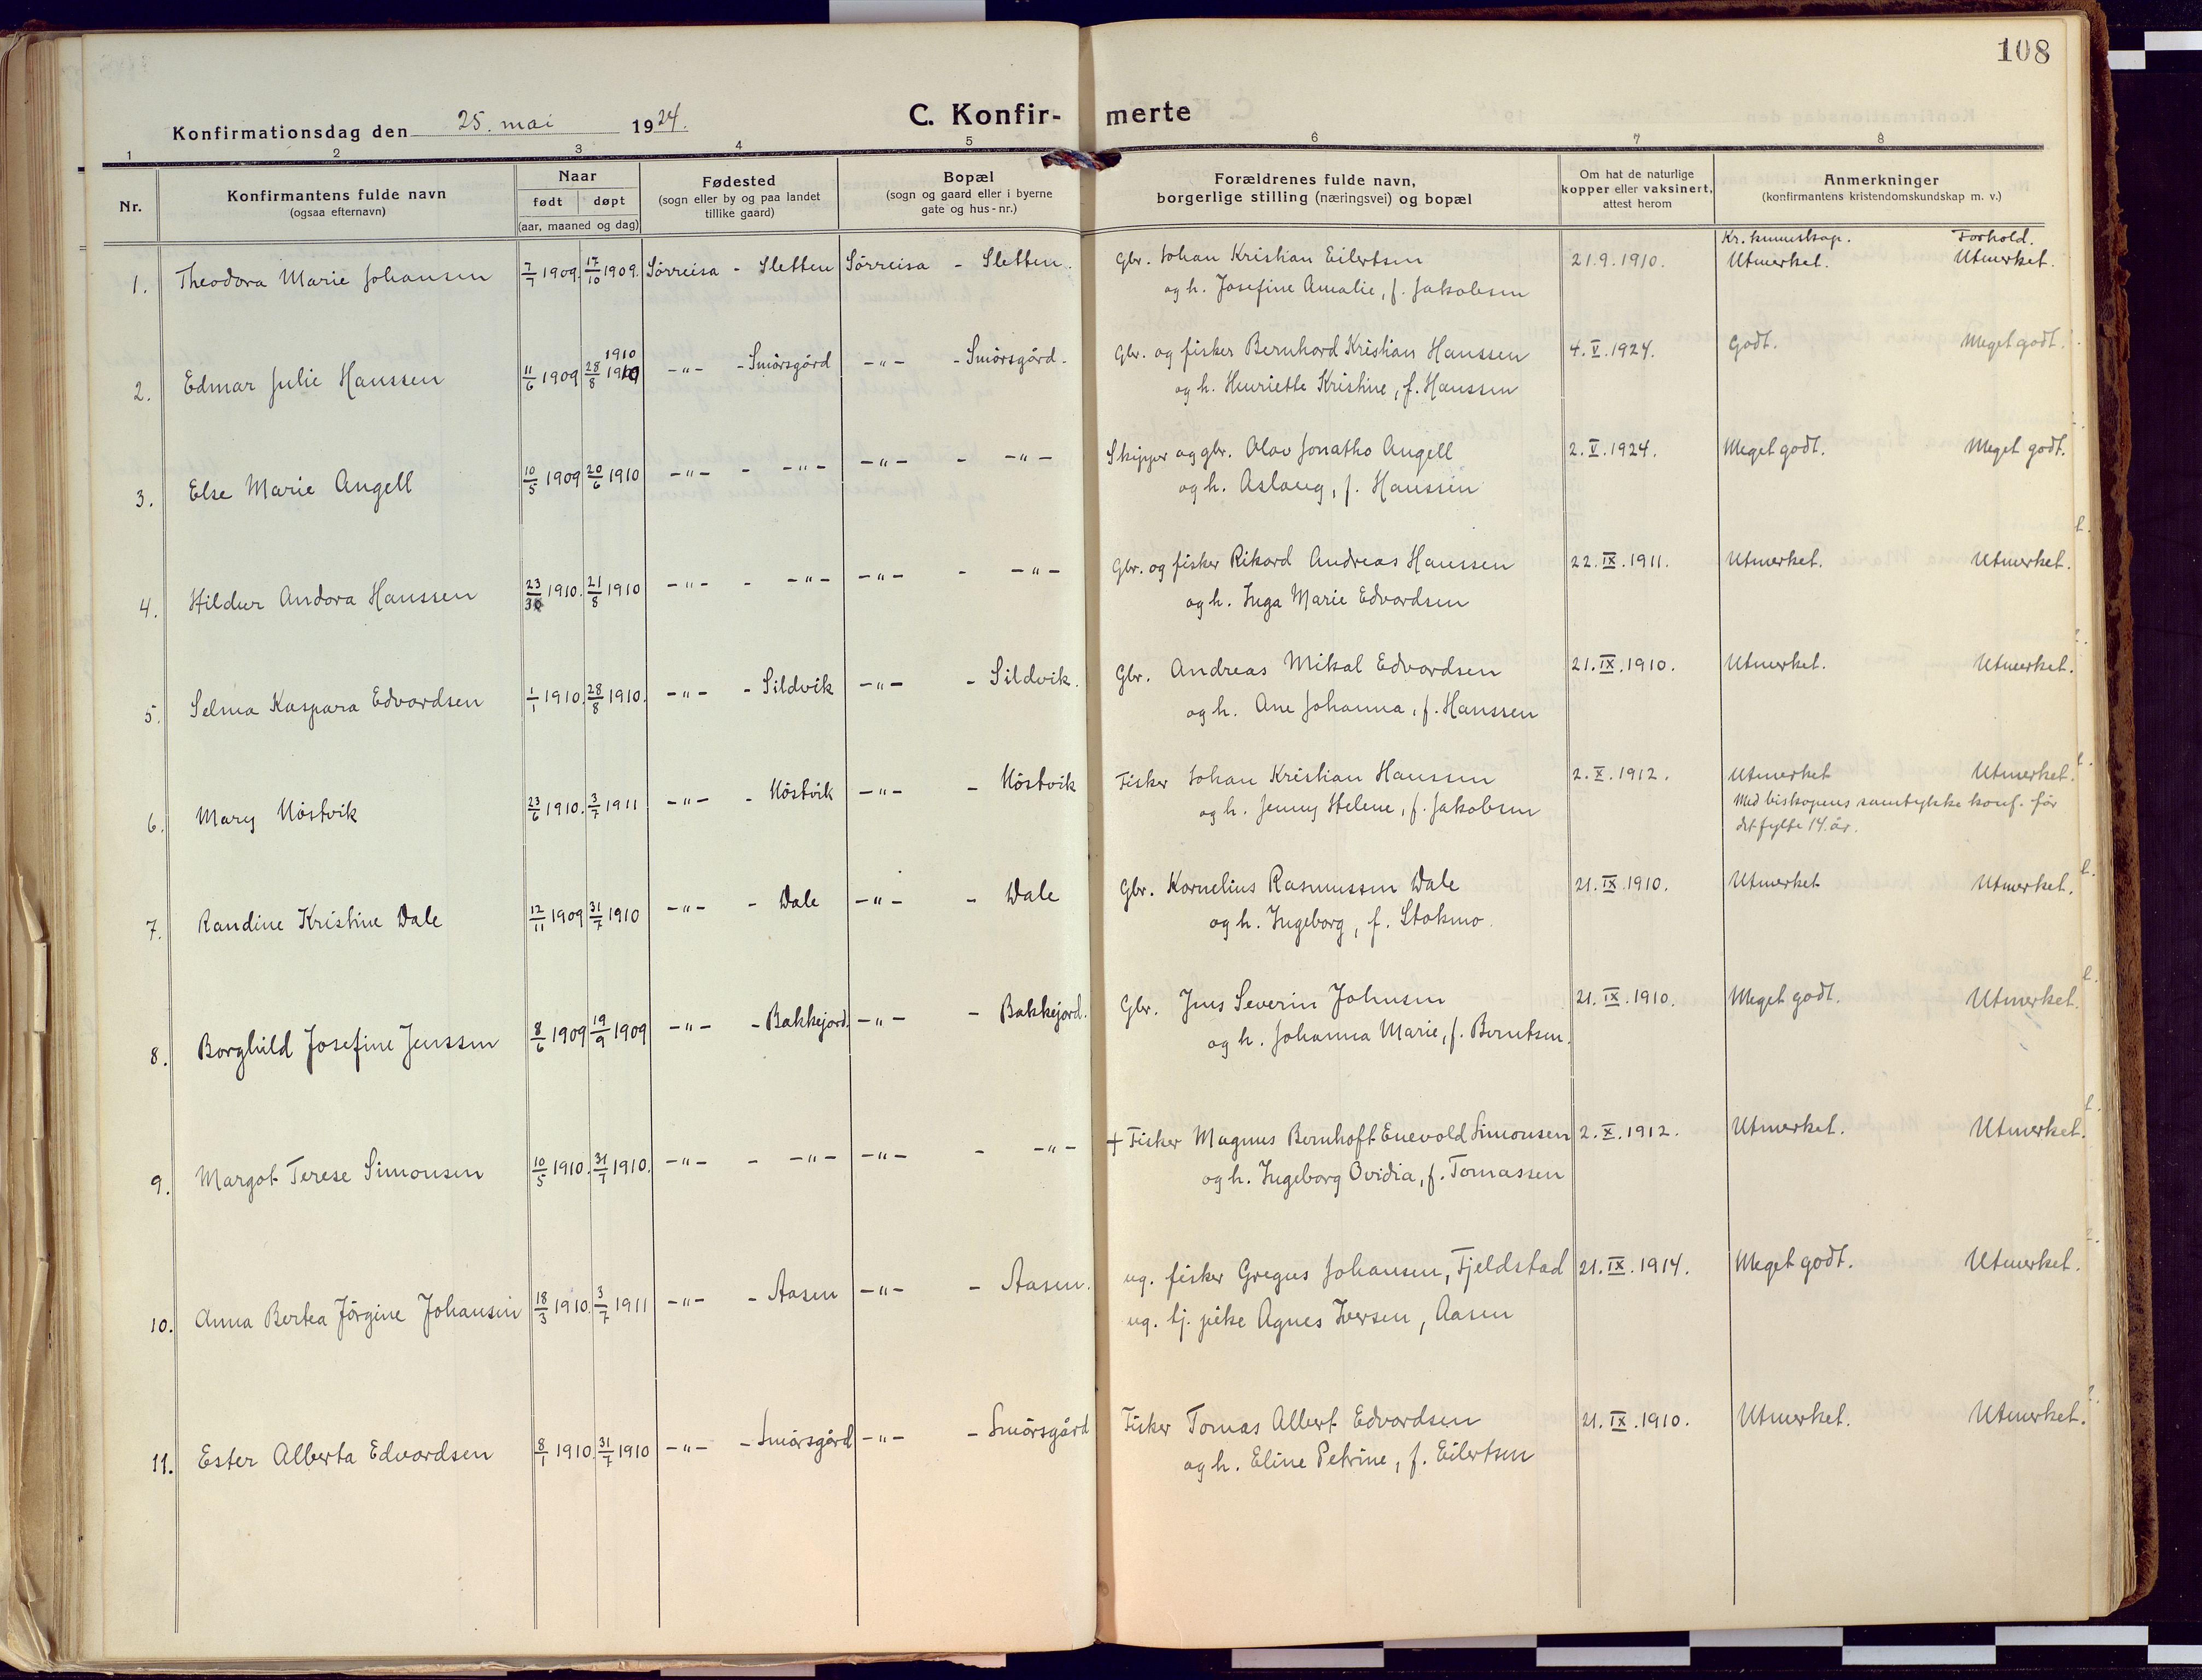 SATØ, Tranøy sokneprestkontor, I/Ia/Iaa/L0015kirke: Ministerialbok nr. 15, 1919-1928, s. 108